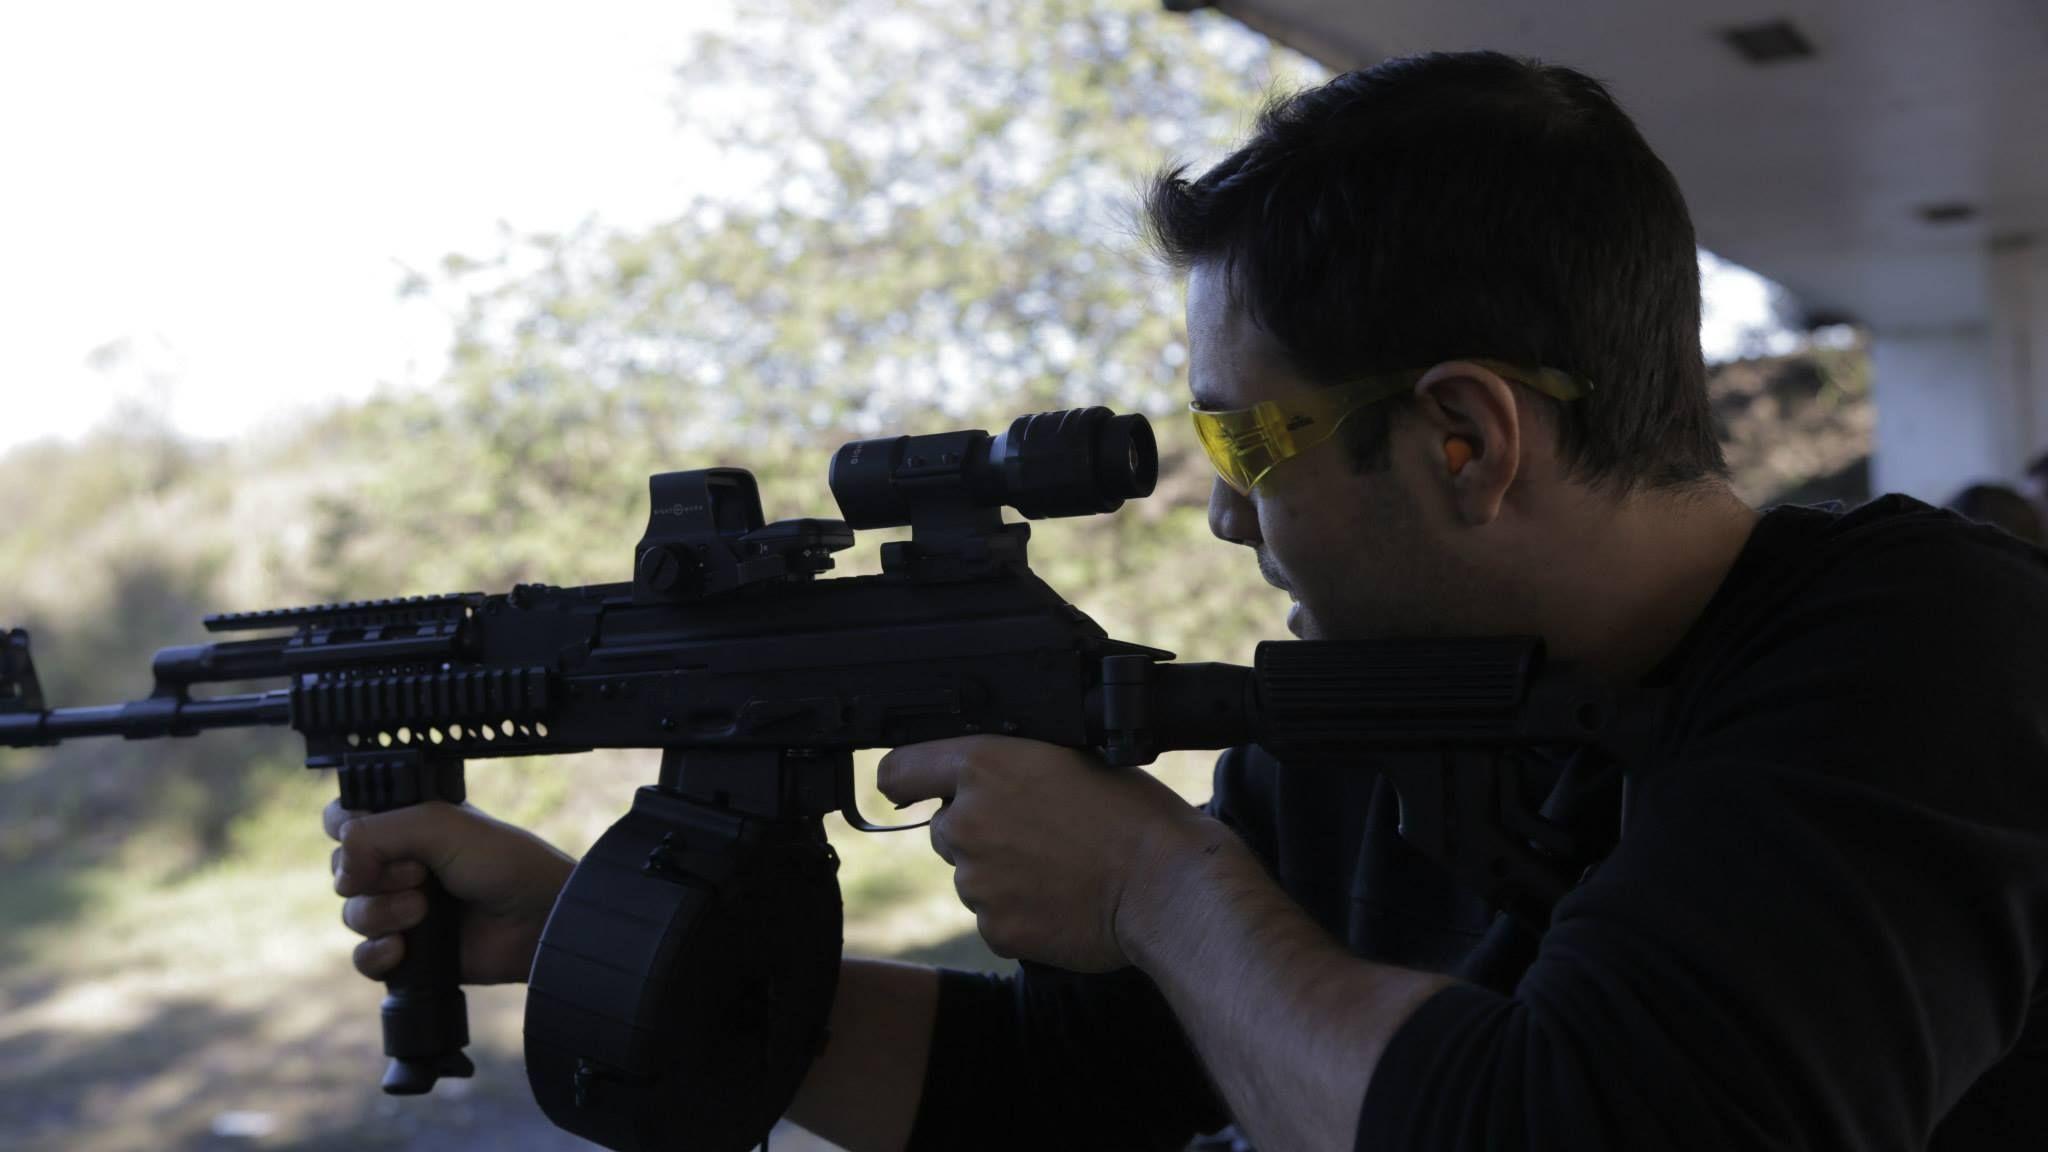 Miami Shooters Club - Gun Club for Men & Women - Newbies OK